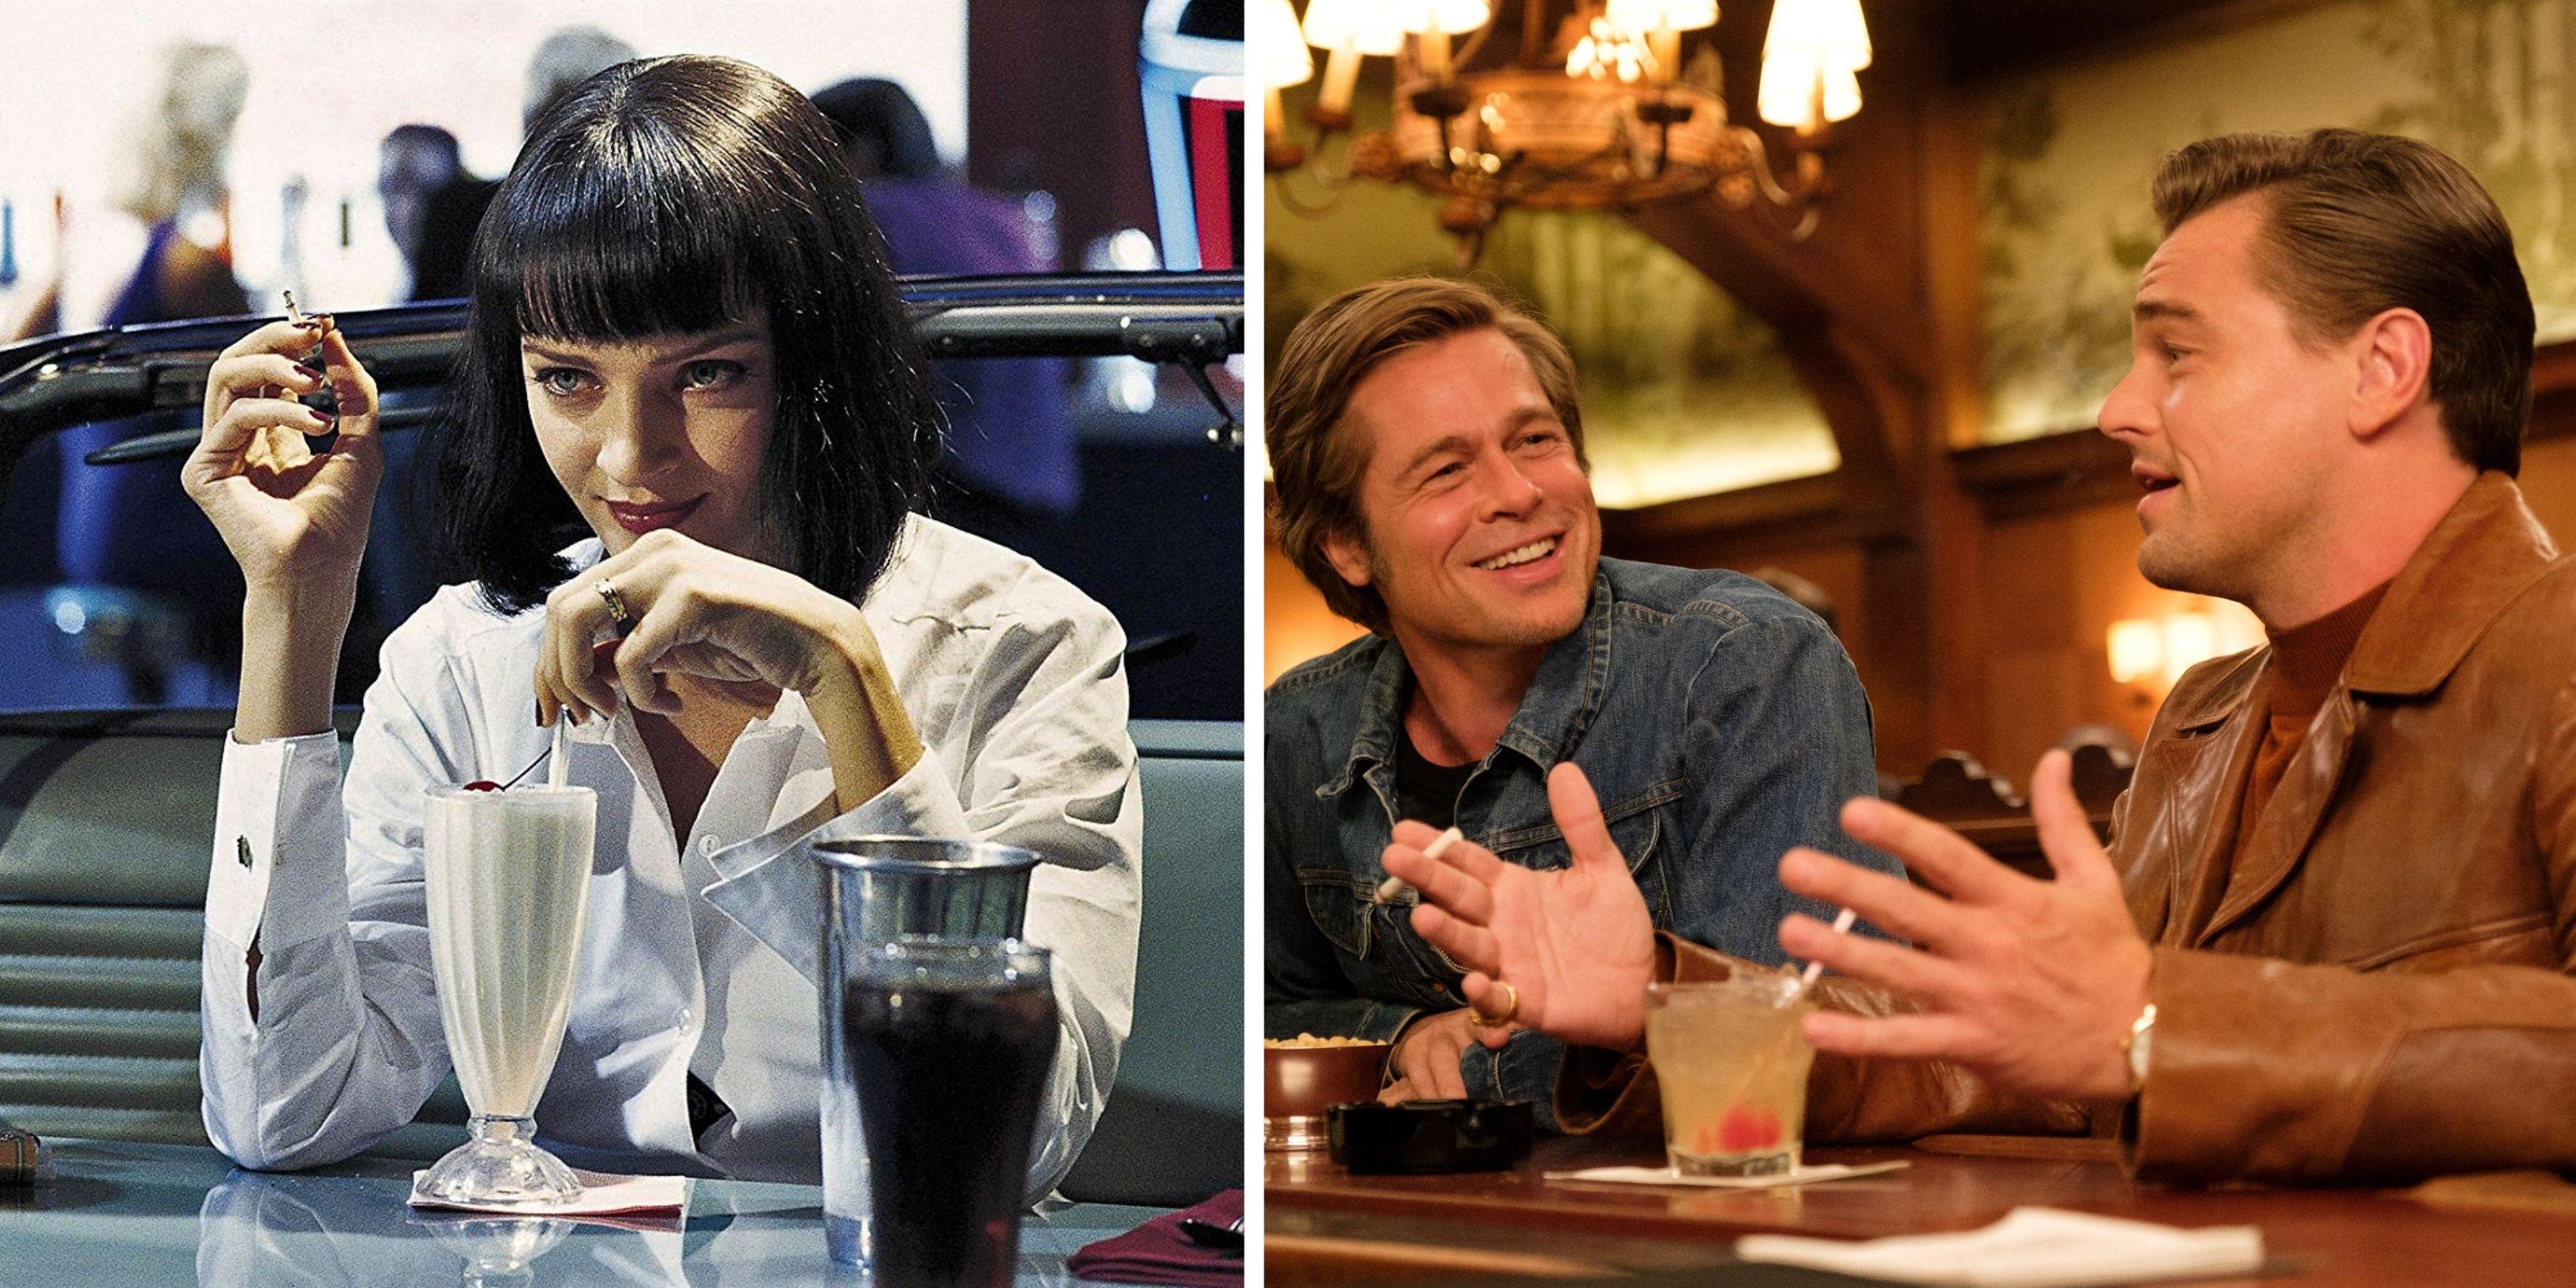 Quentin Tarantino's 10 Best Movies, Ranked According To IMDb